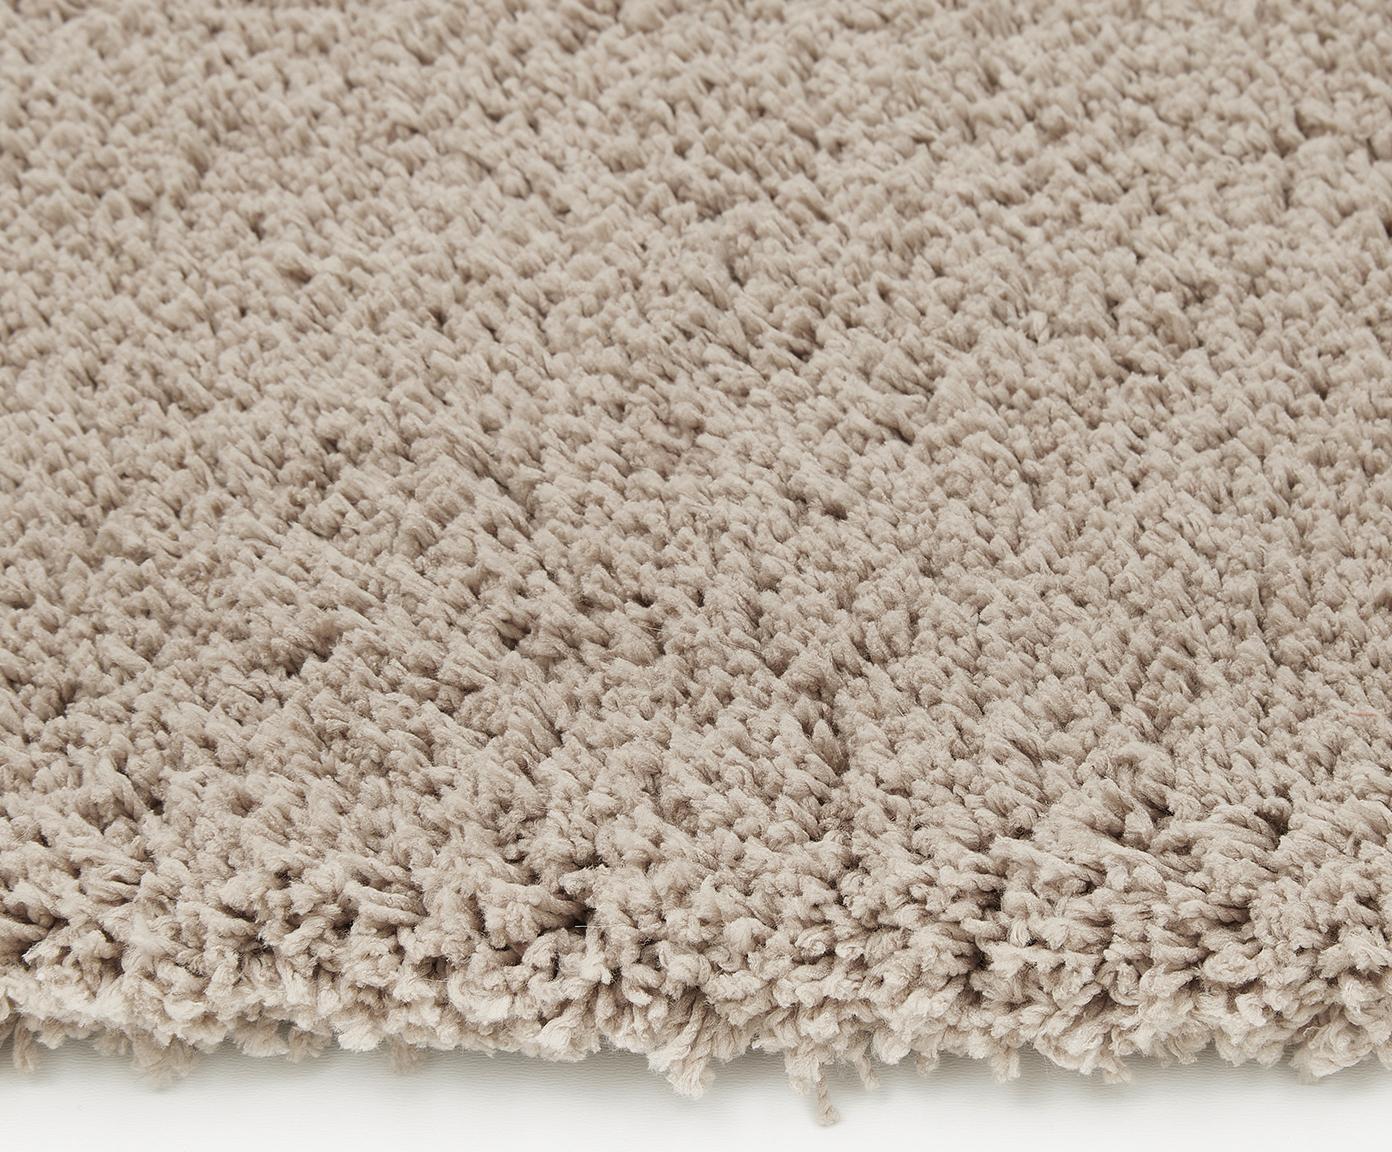 Načechraný koberec svysokým vlasem Leighton, Béžová